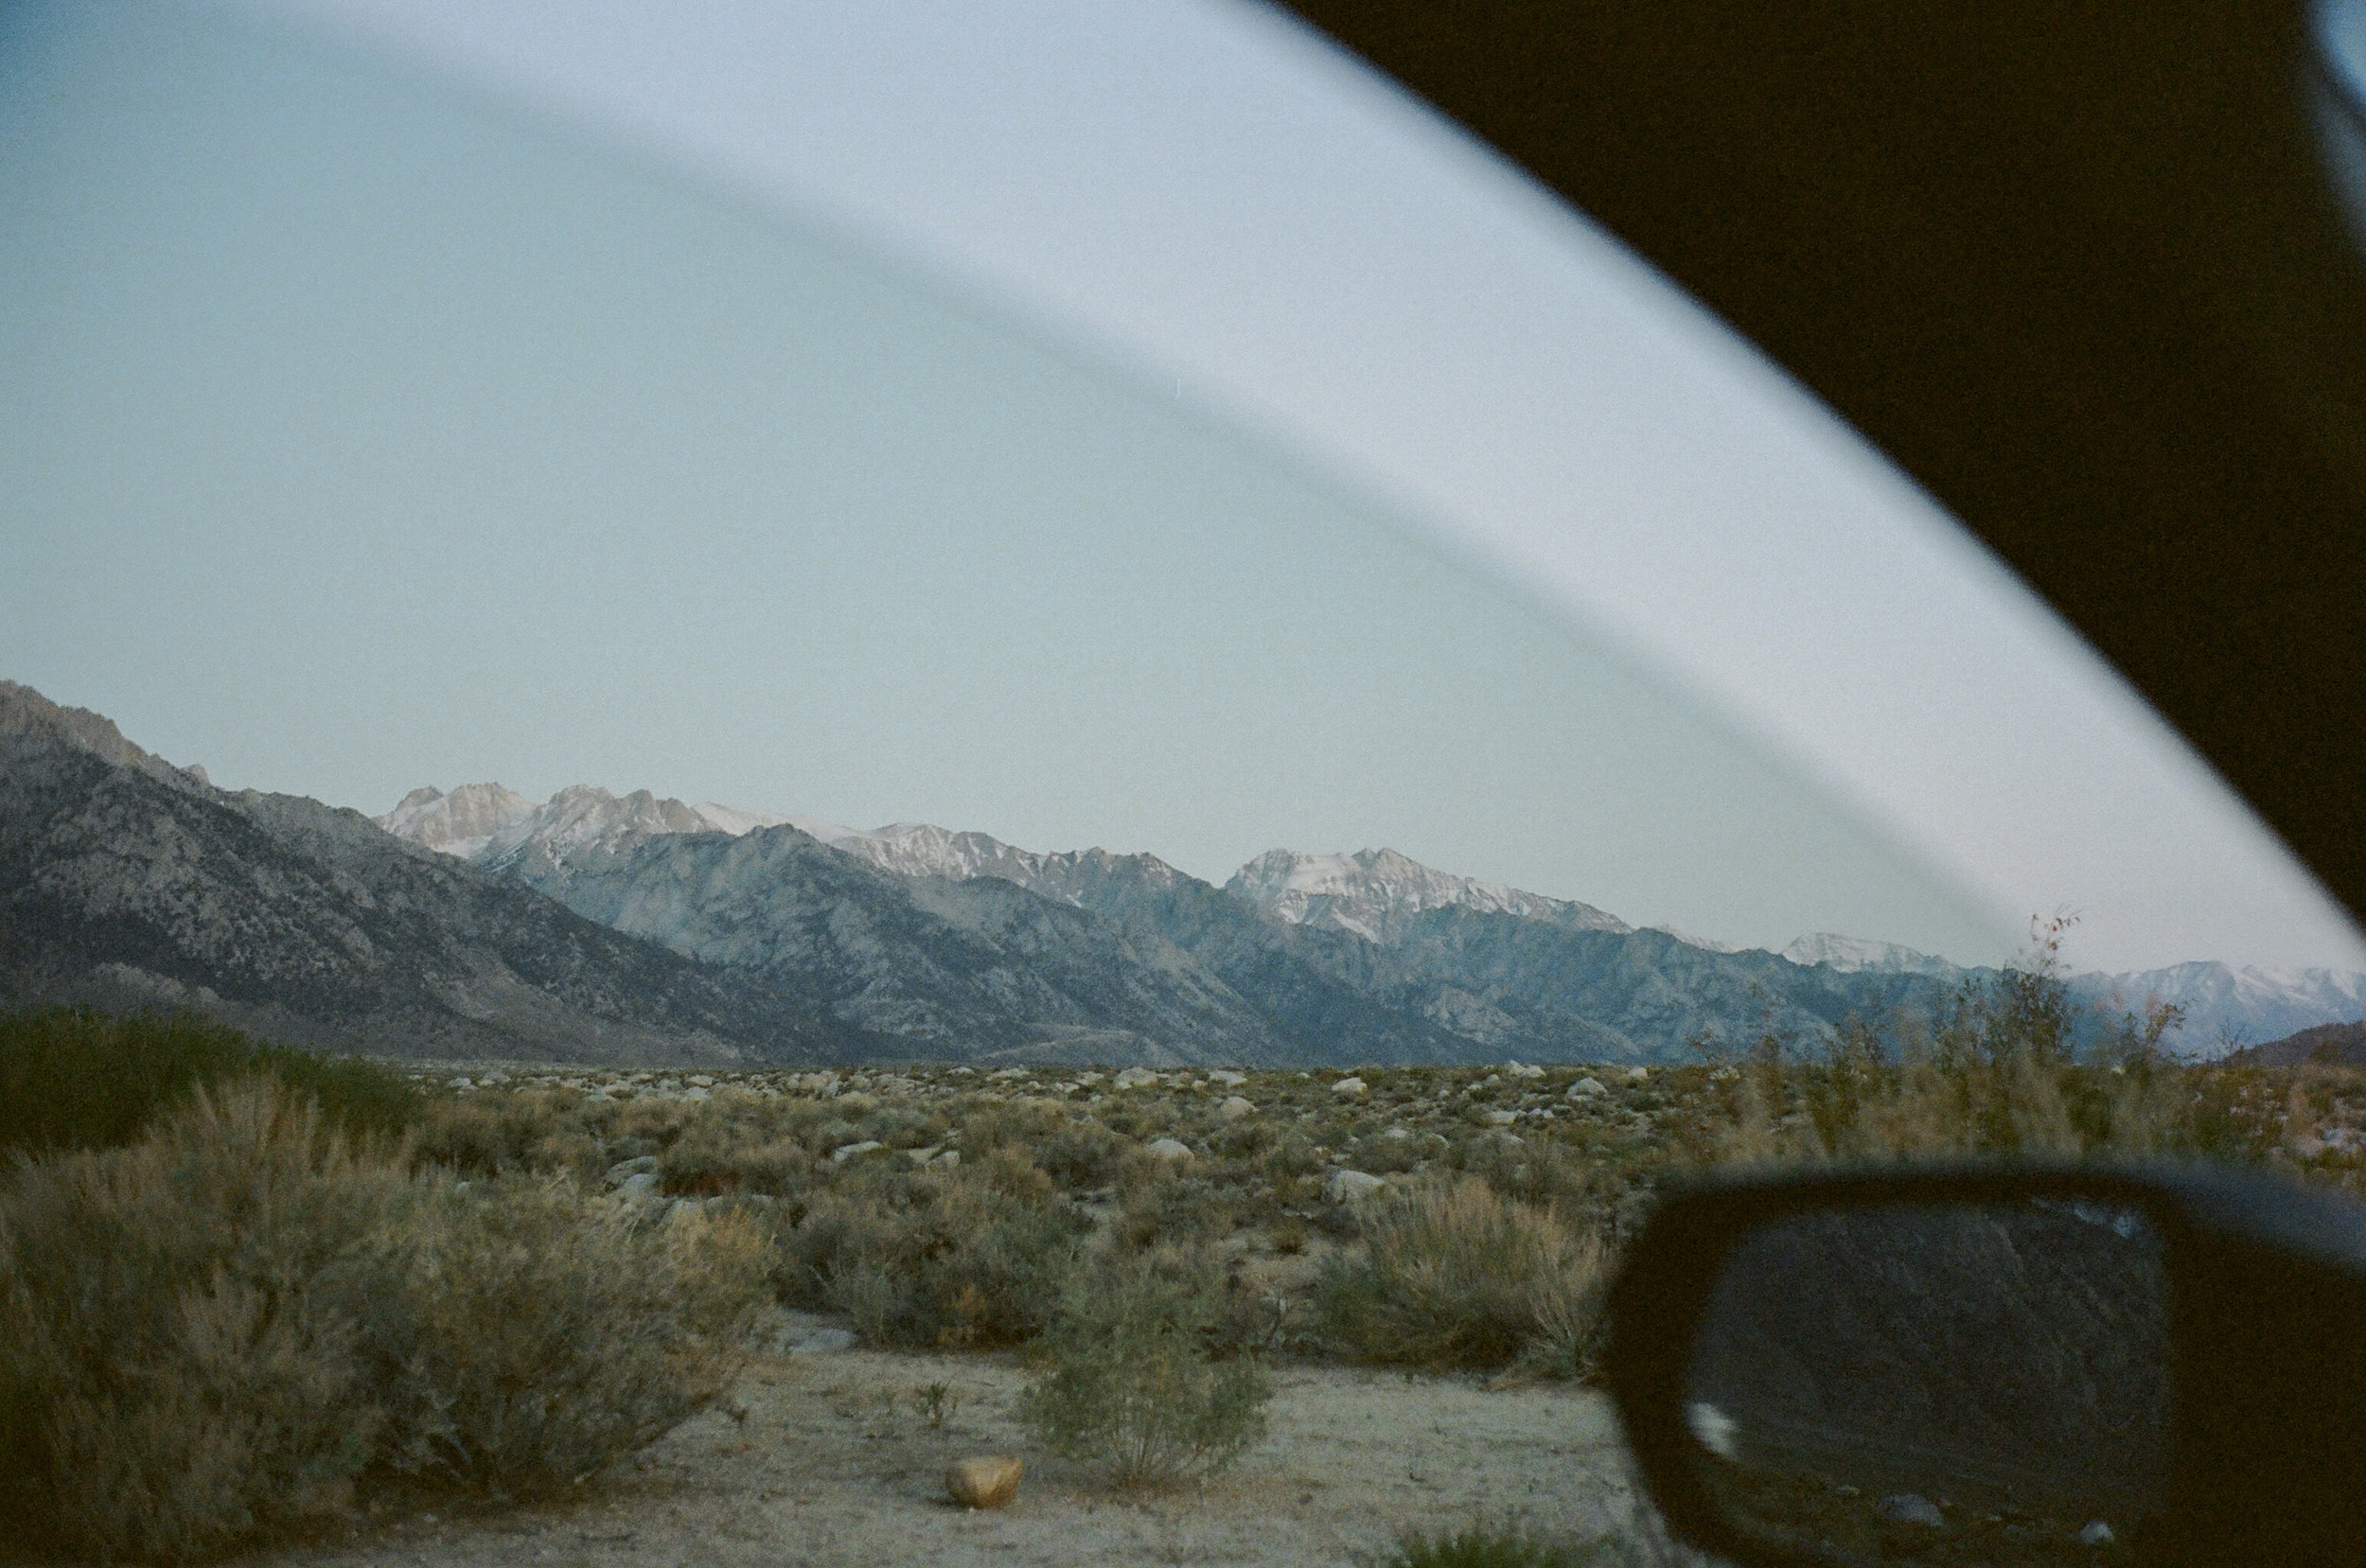 Mountain views through the car window